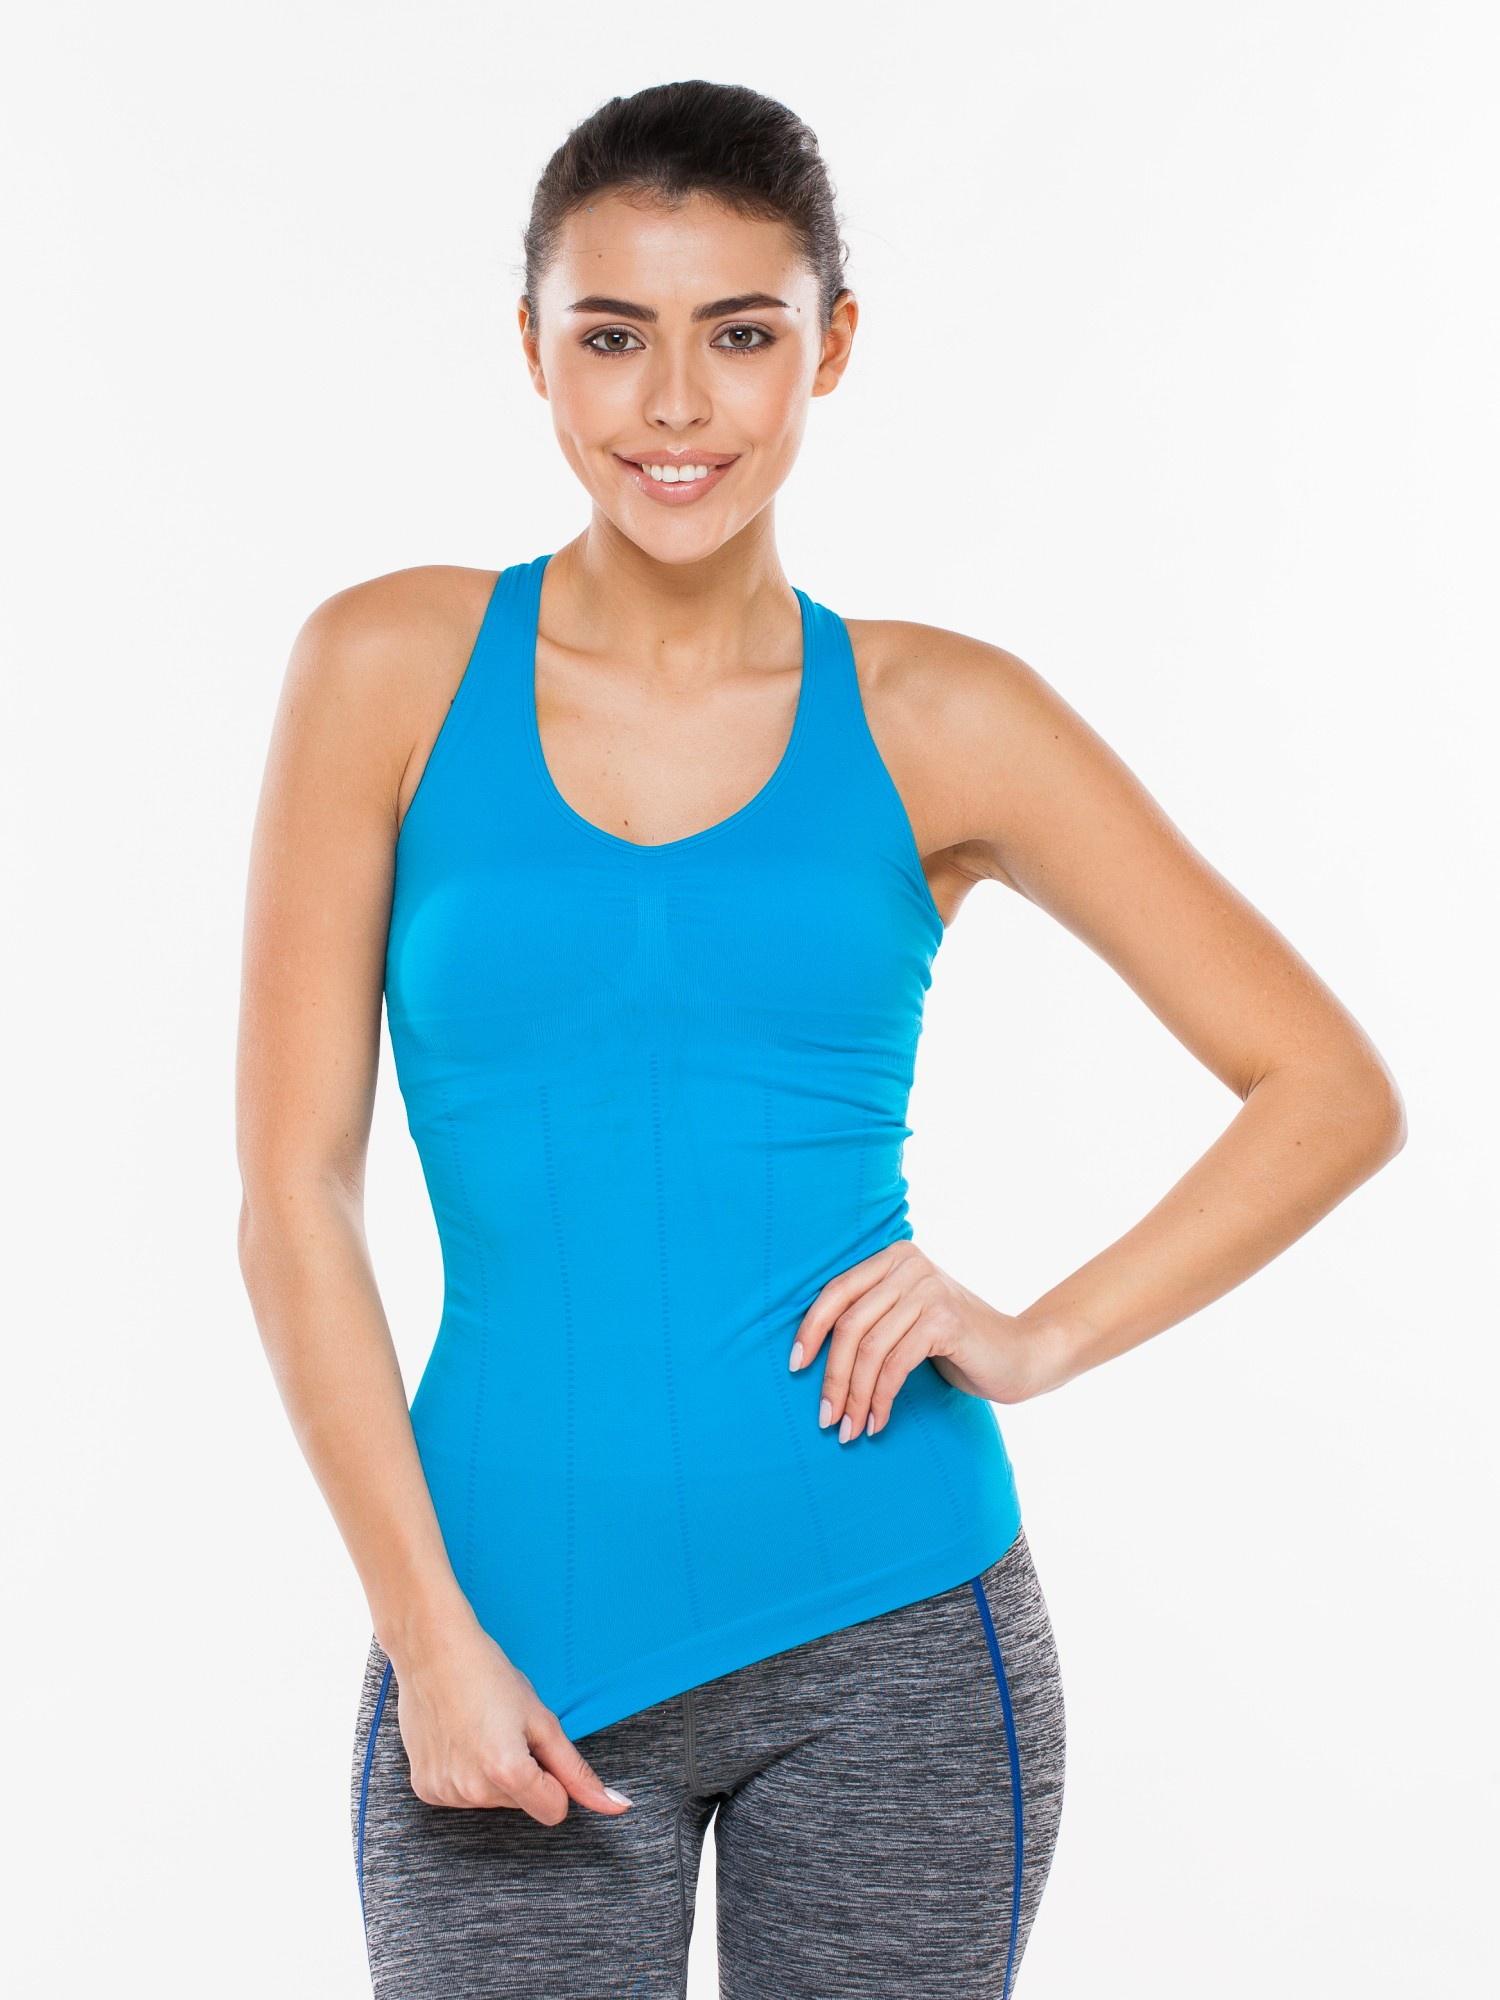 Майка MORERA 35480M SKY BLUE (S), синий 40, 42 размер35480M SKY BLUE (S)Спортивная майка для спорта, фитнеса, бега, йоги и т.д.